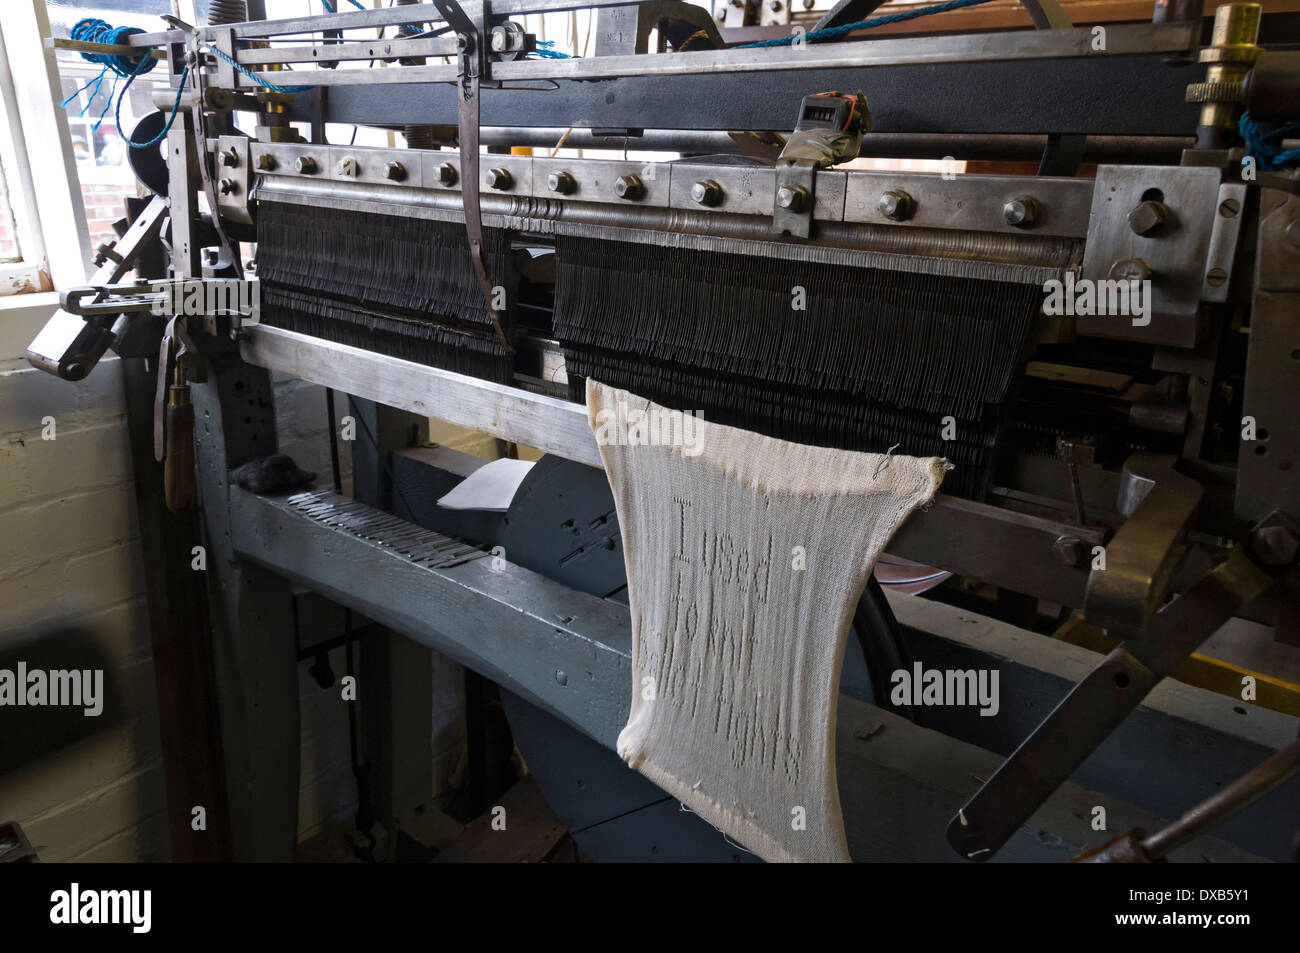 Knitting Machine Imágenes De Stock & Knitting Machine Fotos De Stock ...